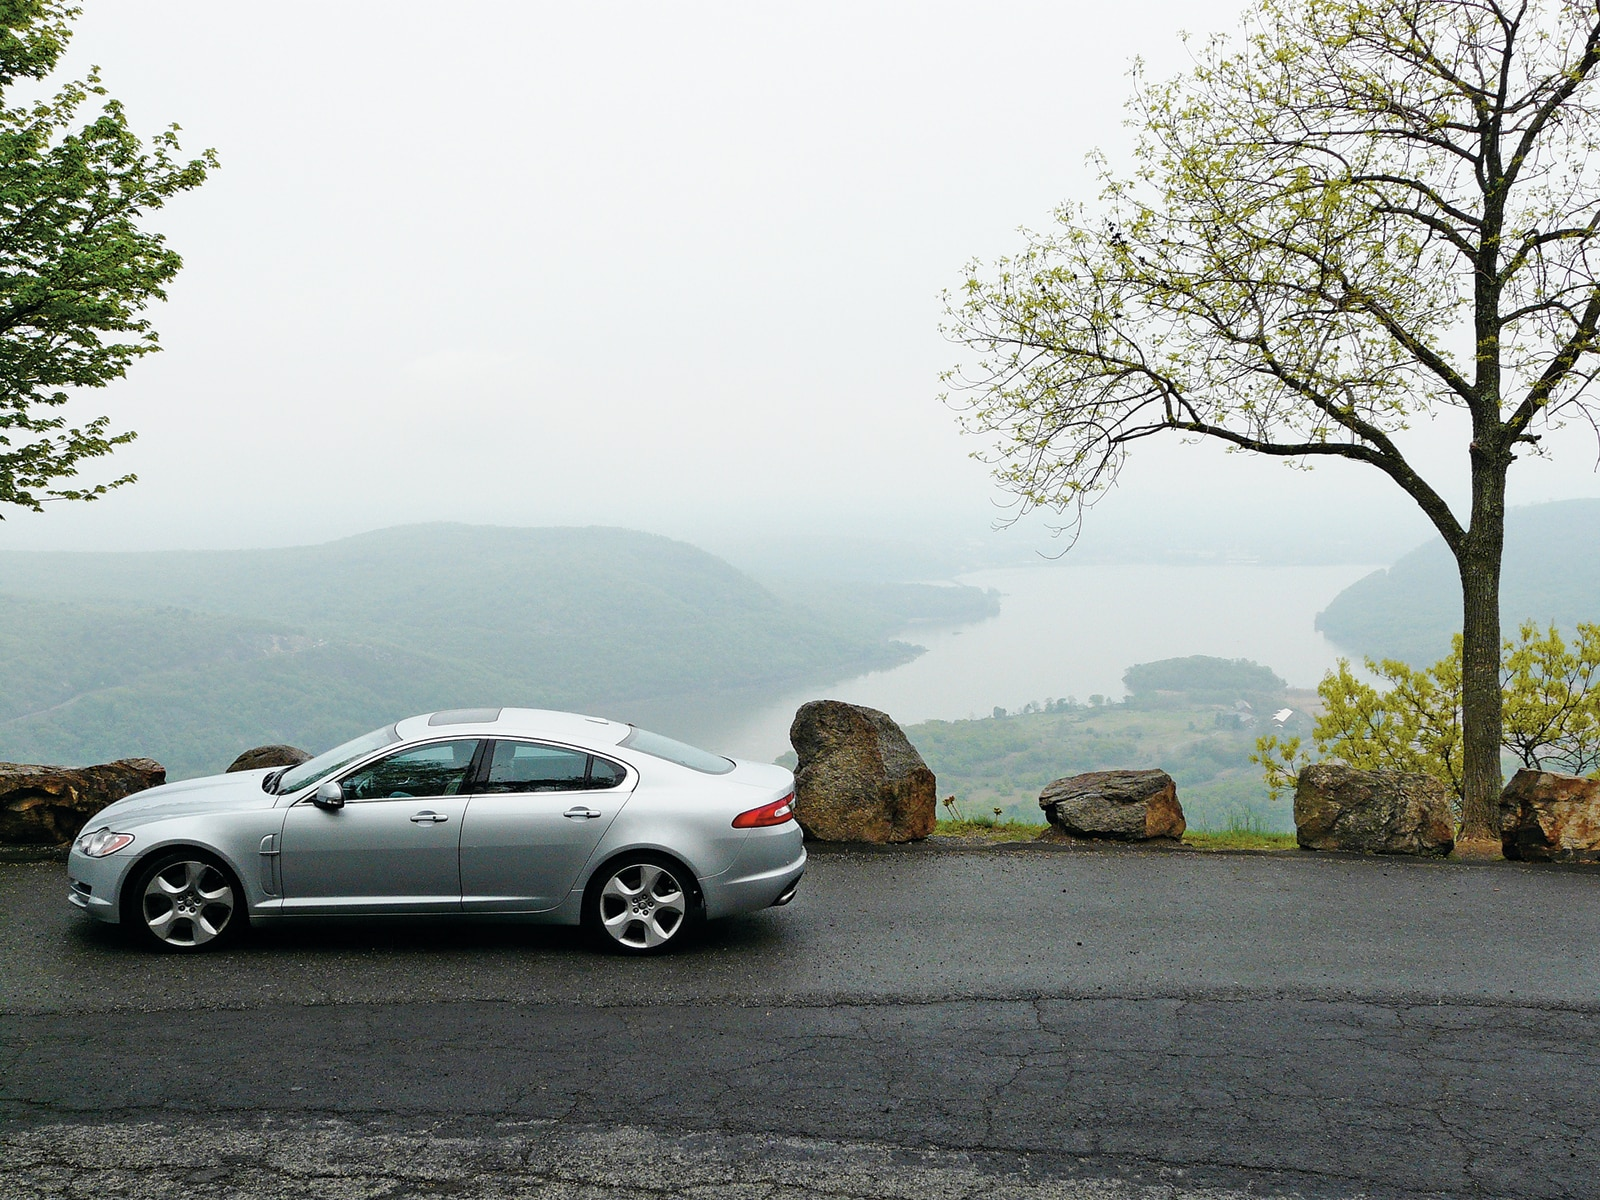 2009 jaguar xf supercharged long term wrap up review automobile magazine. Black Bedroom Furniture Sets. Home Design Ideas